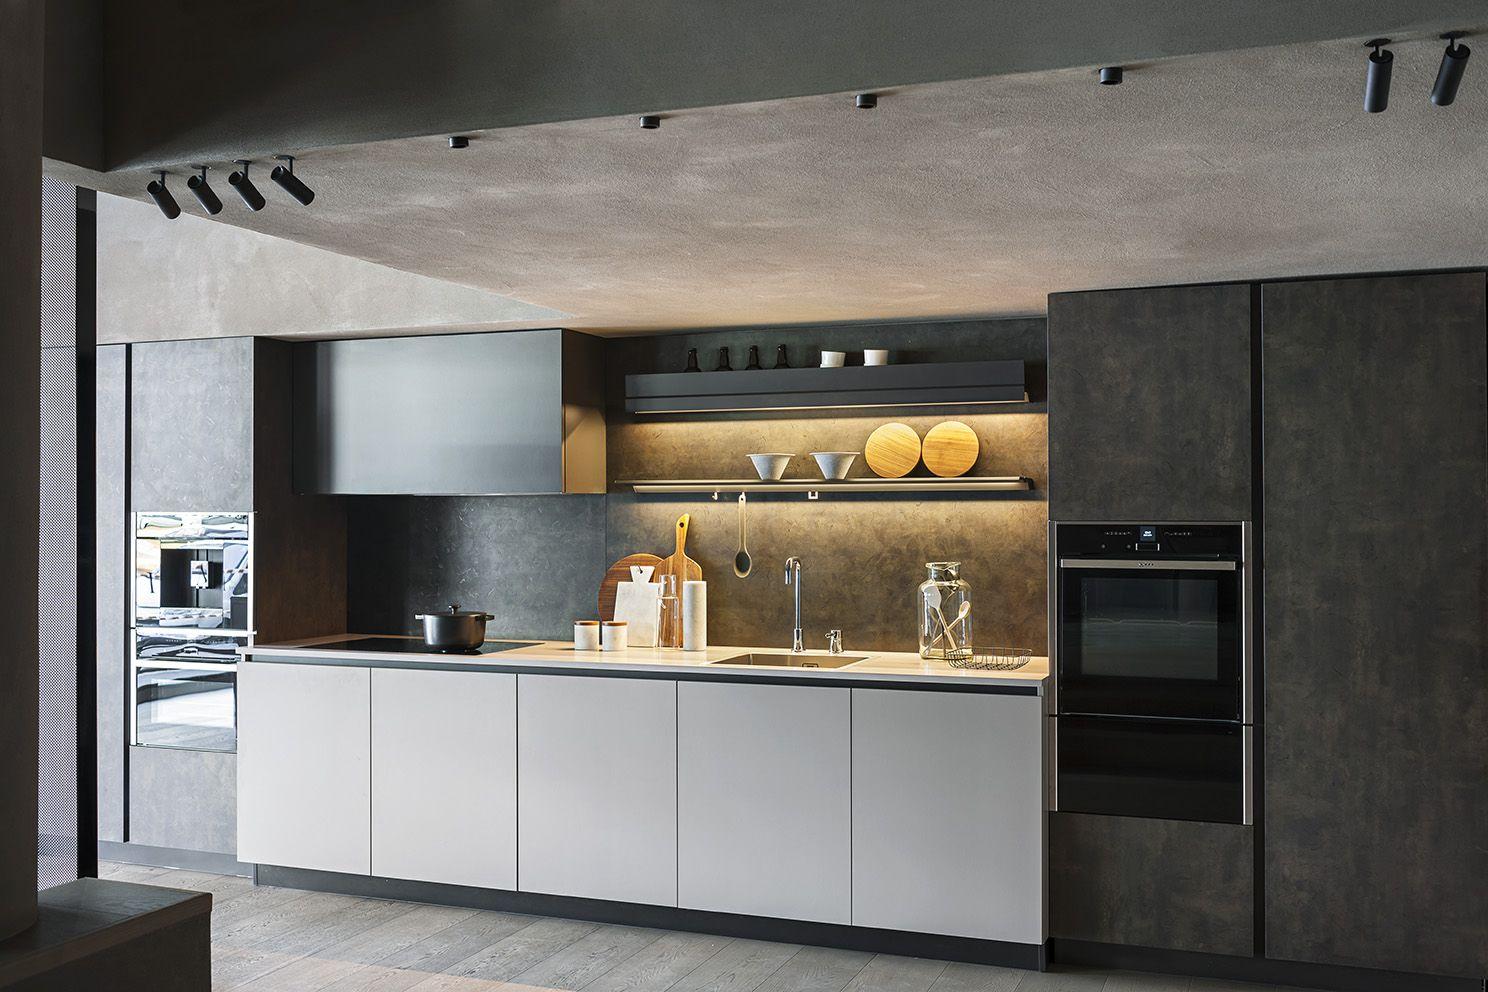 maxima 2 2 base units melamine grigio fumo tall units ossido ghisa wall unit bronzite corian. Black Bedroom Furniture Sets. Home Design Ideas